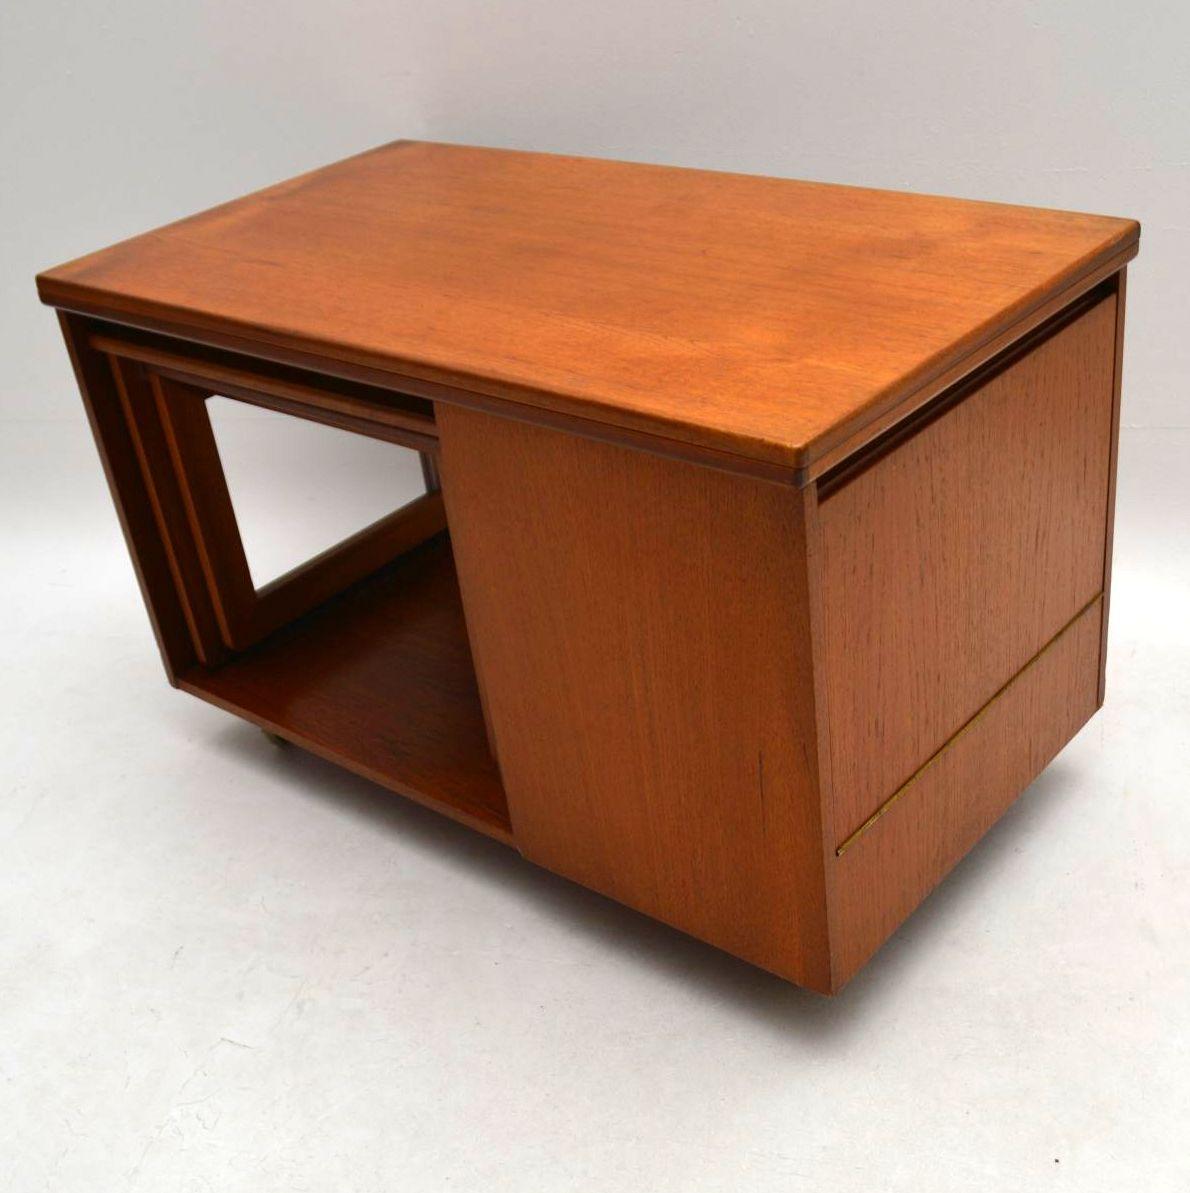 Second Hand Teak Coffee Table: 1960's Teak Tristor Coffee Table By McIntosh